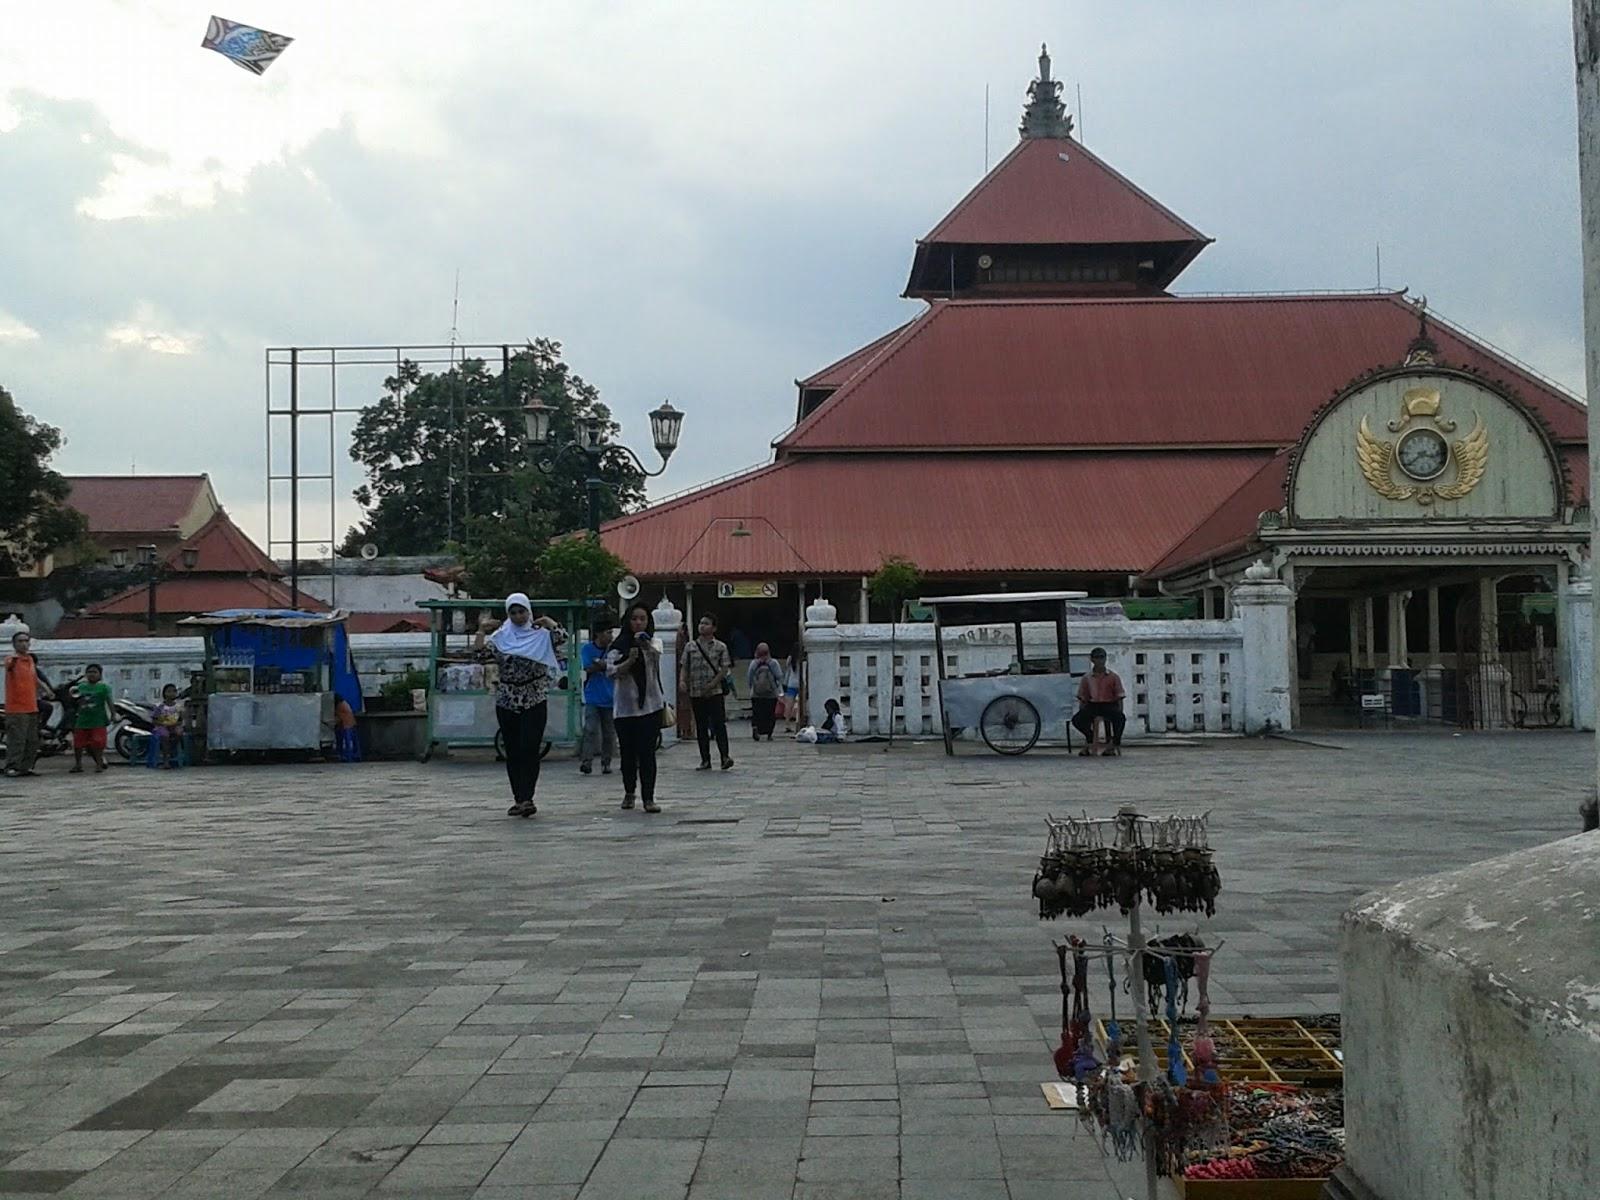 Di depan Masjid Agung Kauman, Yogyakarta